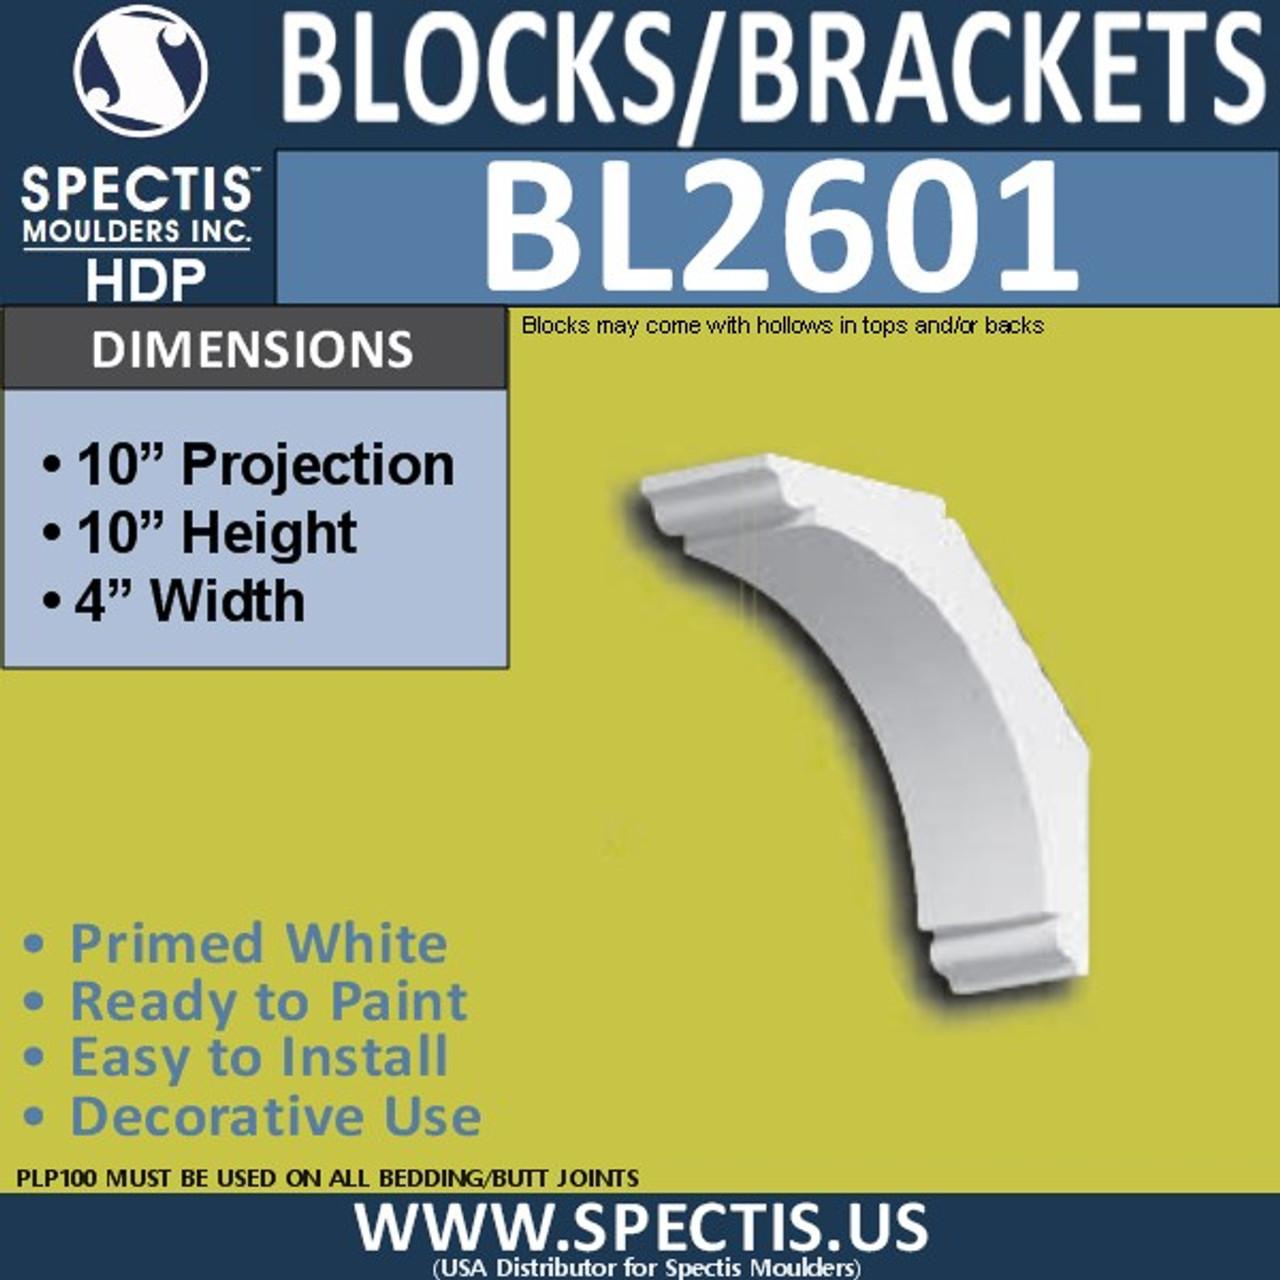 "BL2601 Eave Block or Bracket 4""W x 10""H x 10"" P"